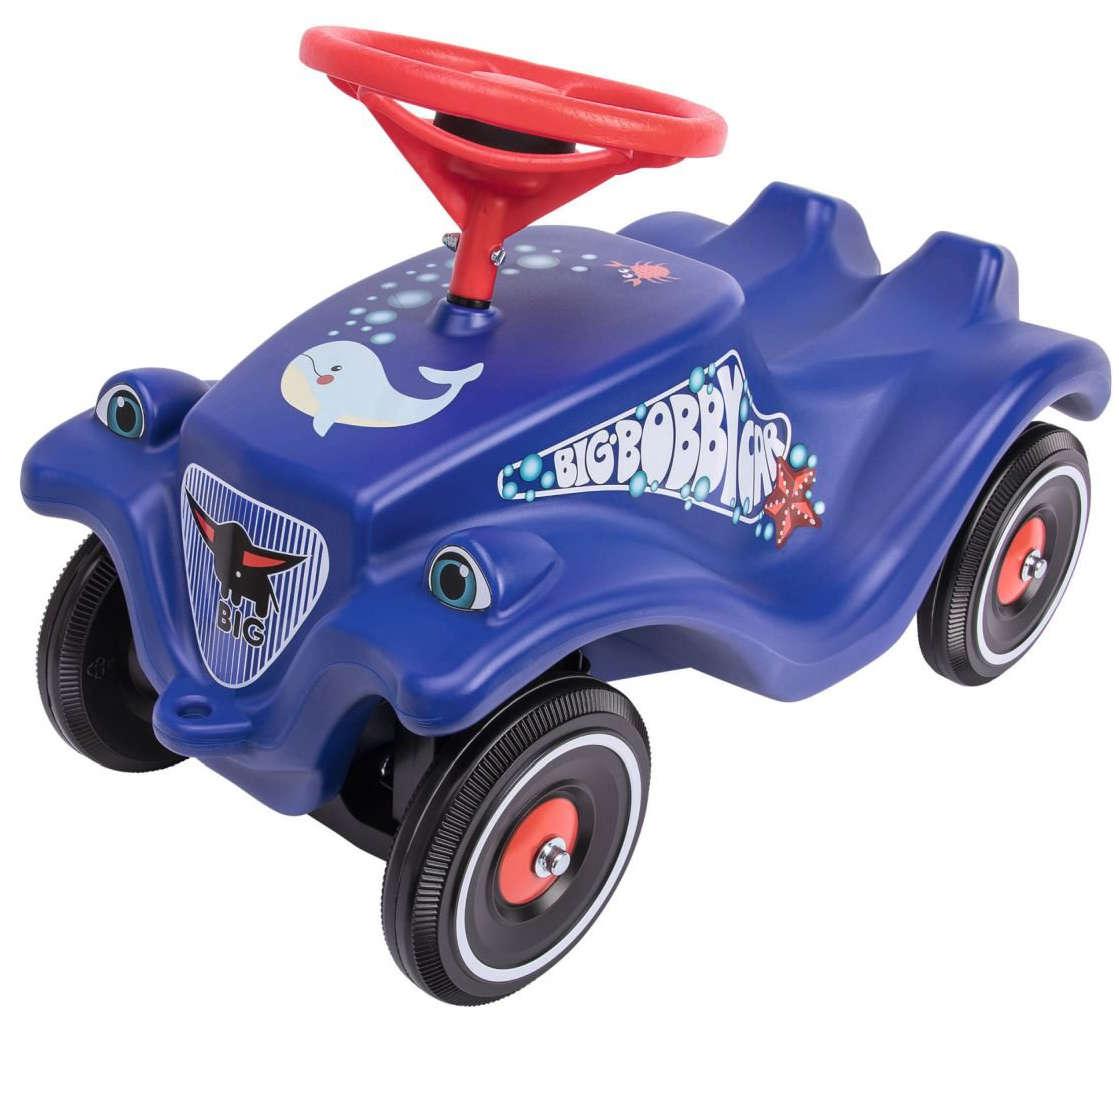 BIG BOBBY CAR CLASSIC Ocean popychacz